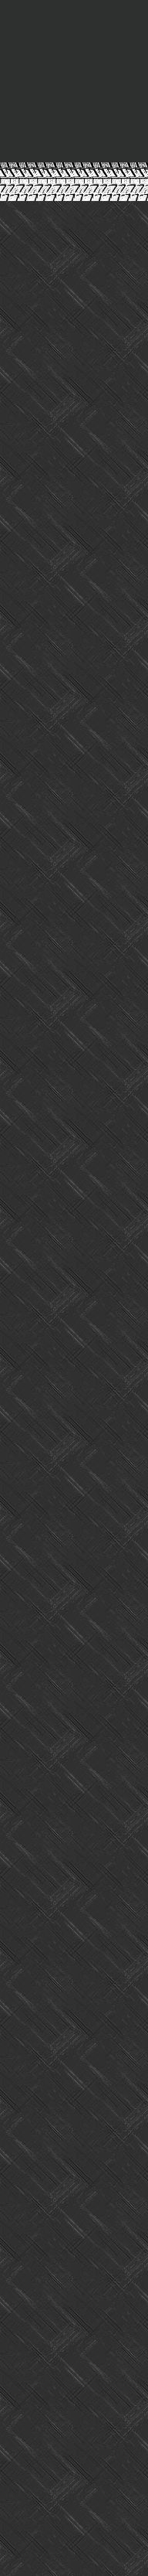 l 39 auto ecole. Black Bedroom Furniture Sets. Home Design Ideas